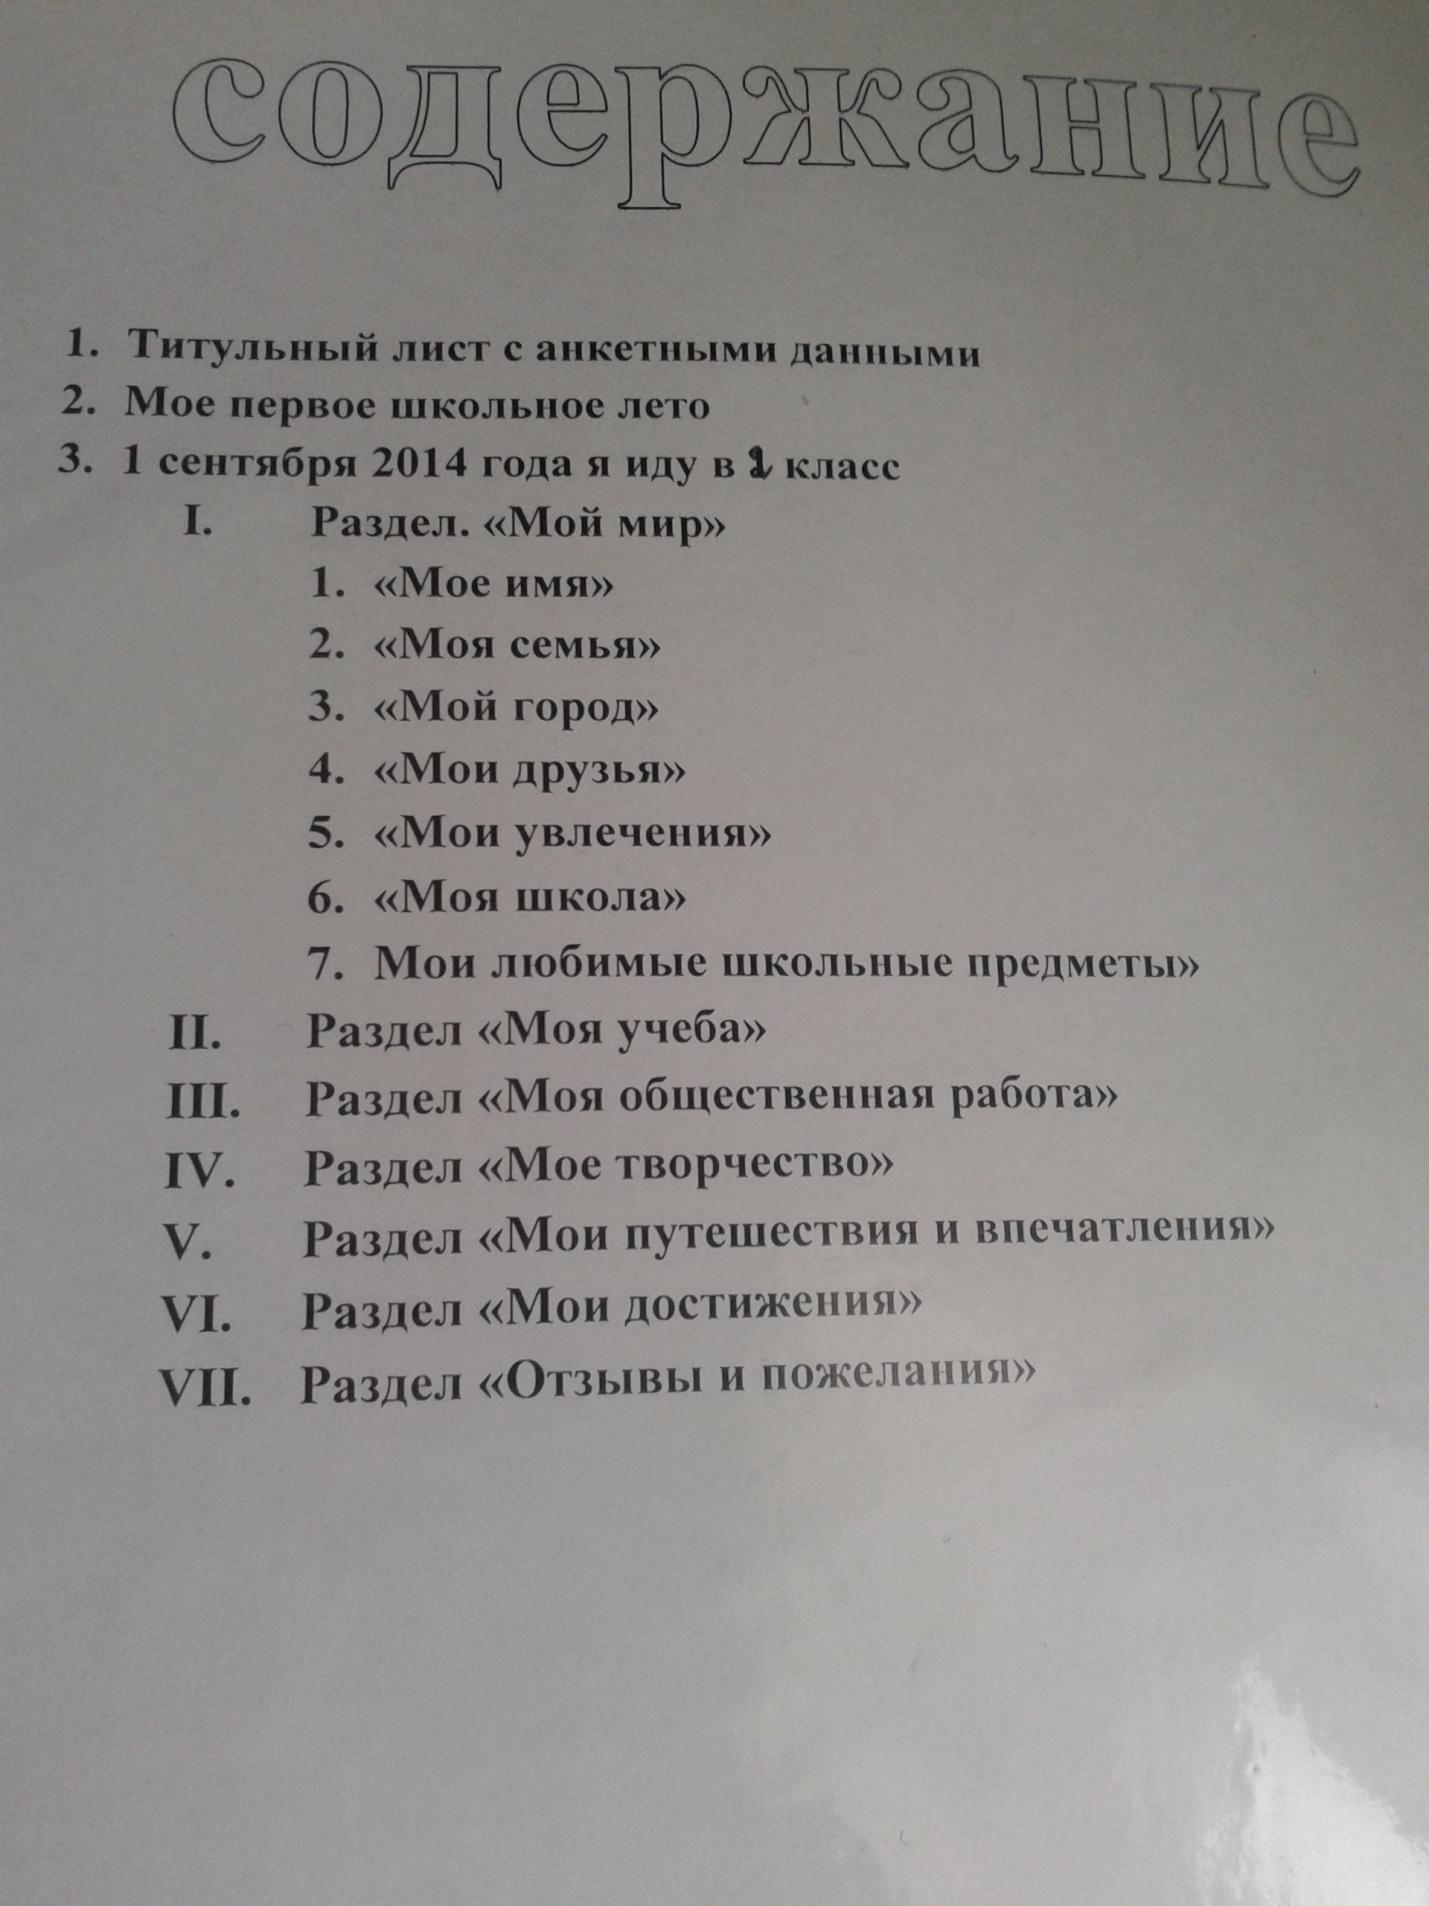 C:\Users\Vladimir\Pictures\2016-01-21 долматов портфолио\долматов портфолио 001.jpg